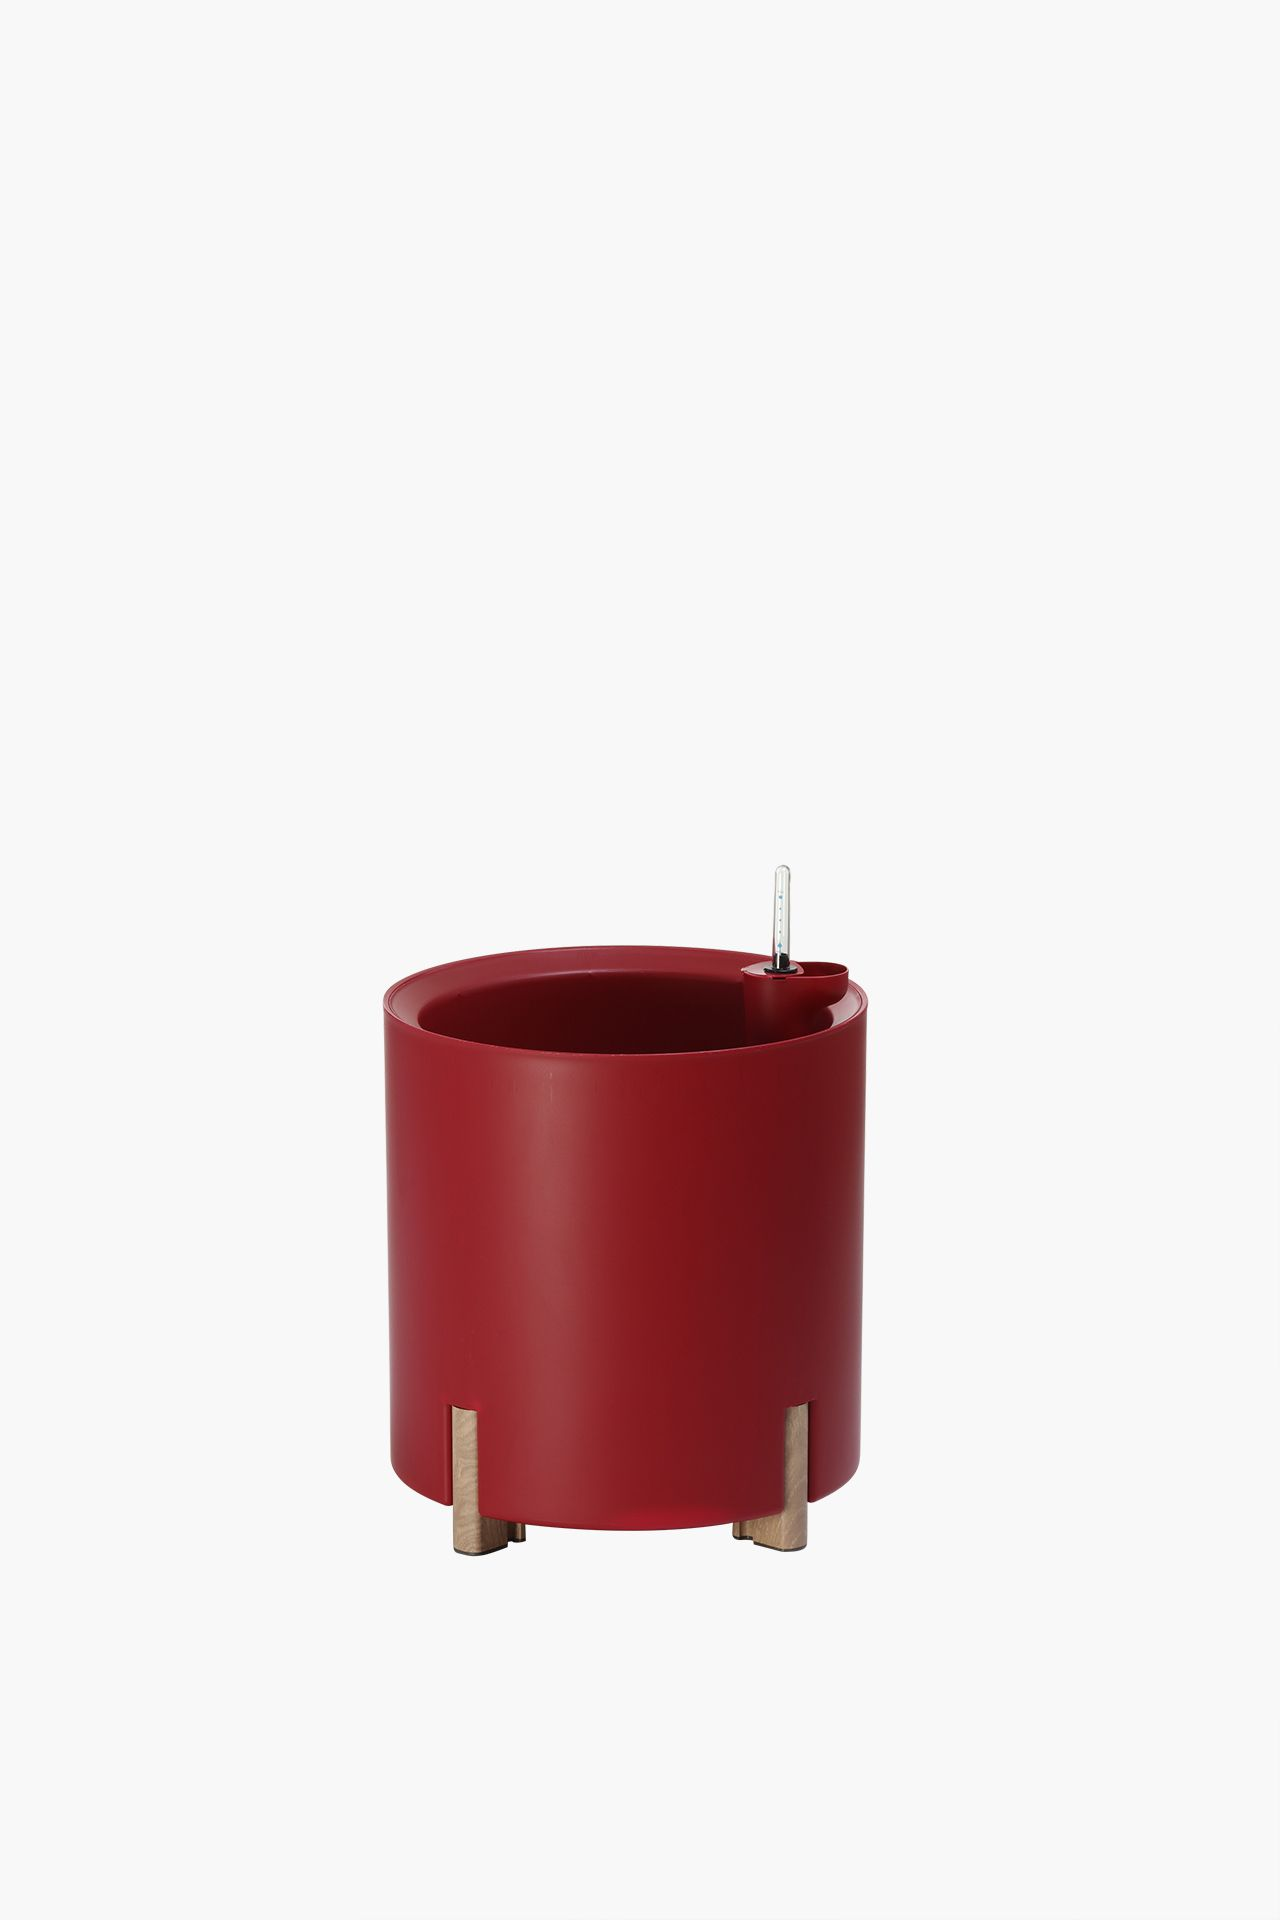 pflanzk bel blumenk bel kunststoff rund mondum tondo 40 cm rot ebay. Black Bedroom Furniture Sets. Home Design Ideas